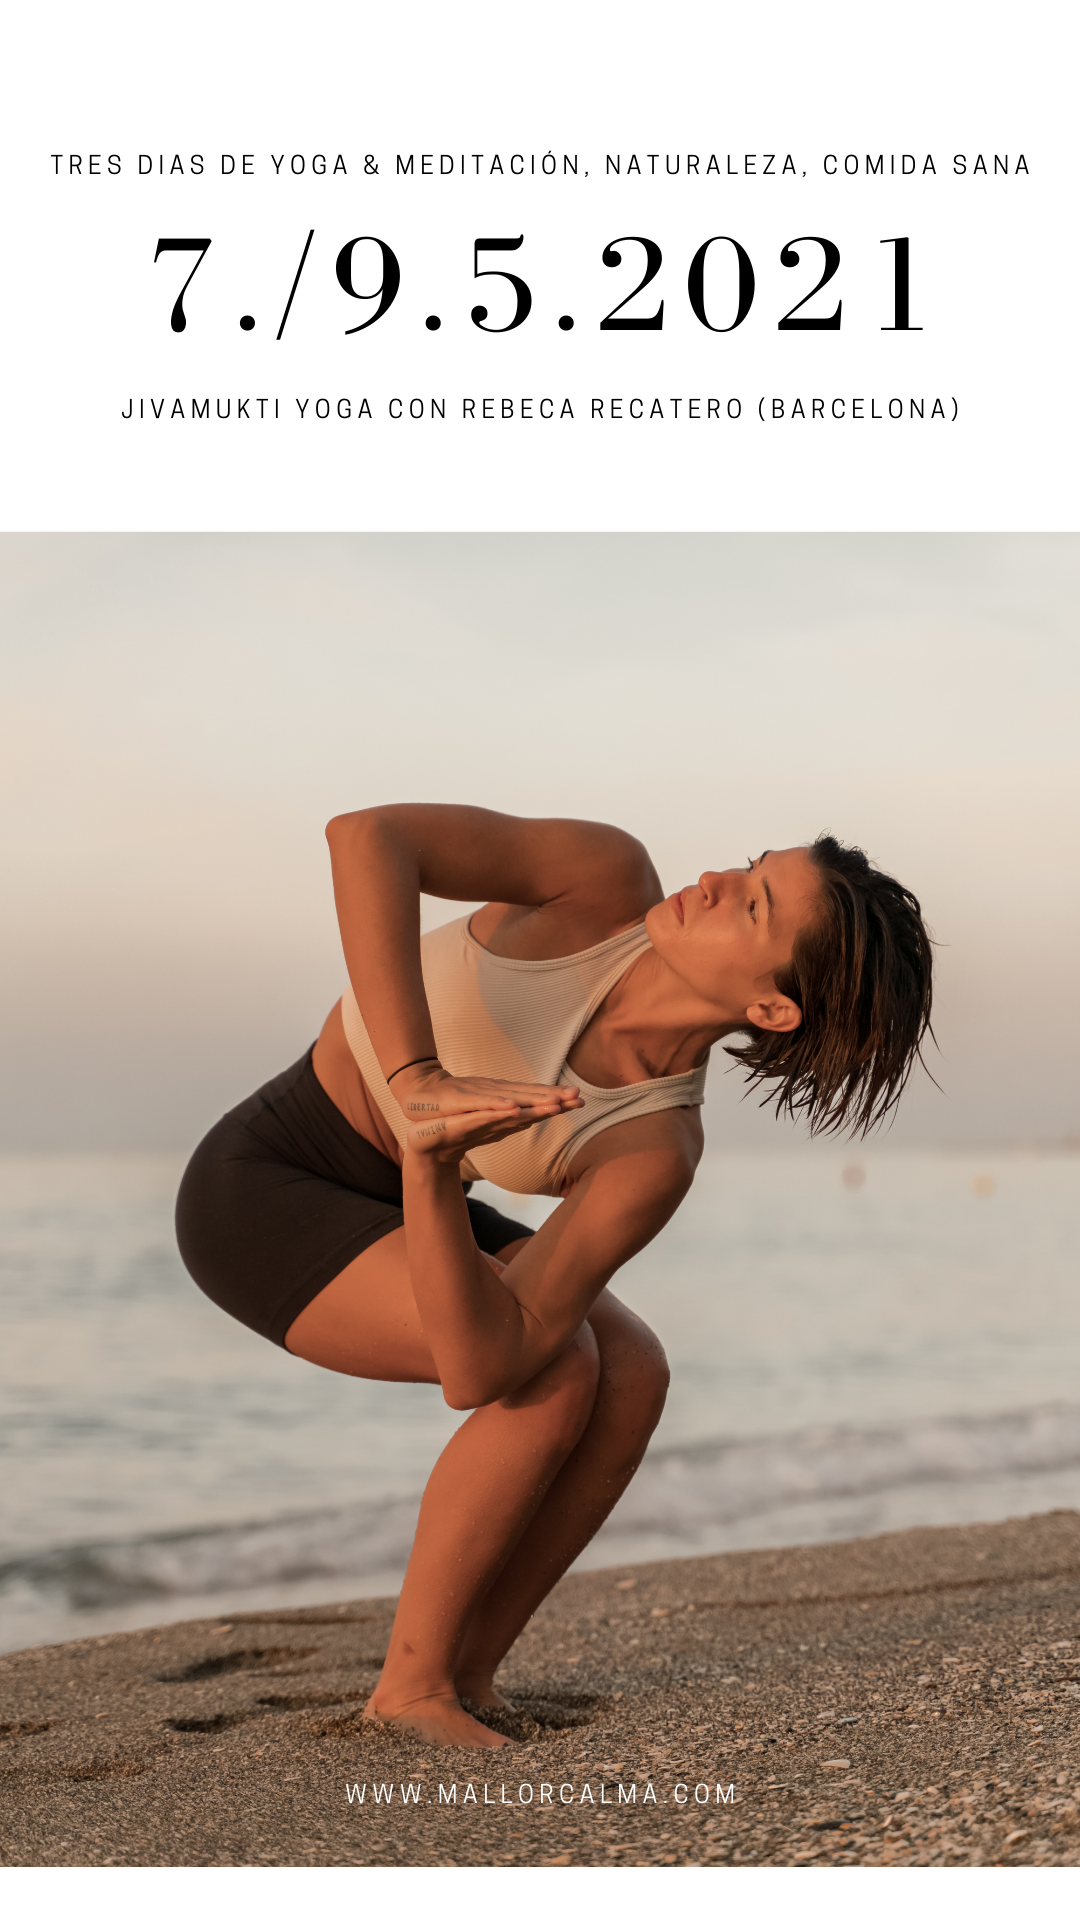 retiro jivamukti yoga retreat rebeca recatero mallorca osa major finca meditacion teacher nature naturaleza campo mayo may 2021